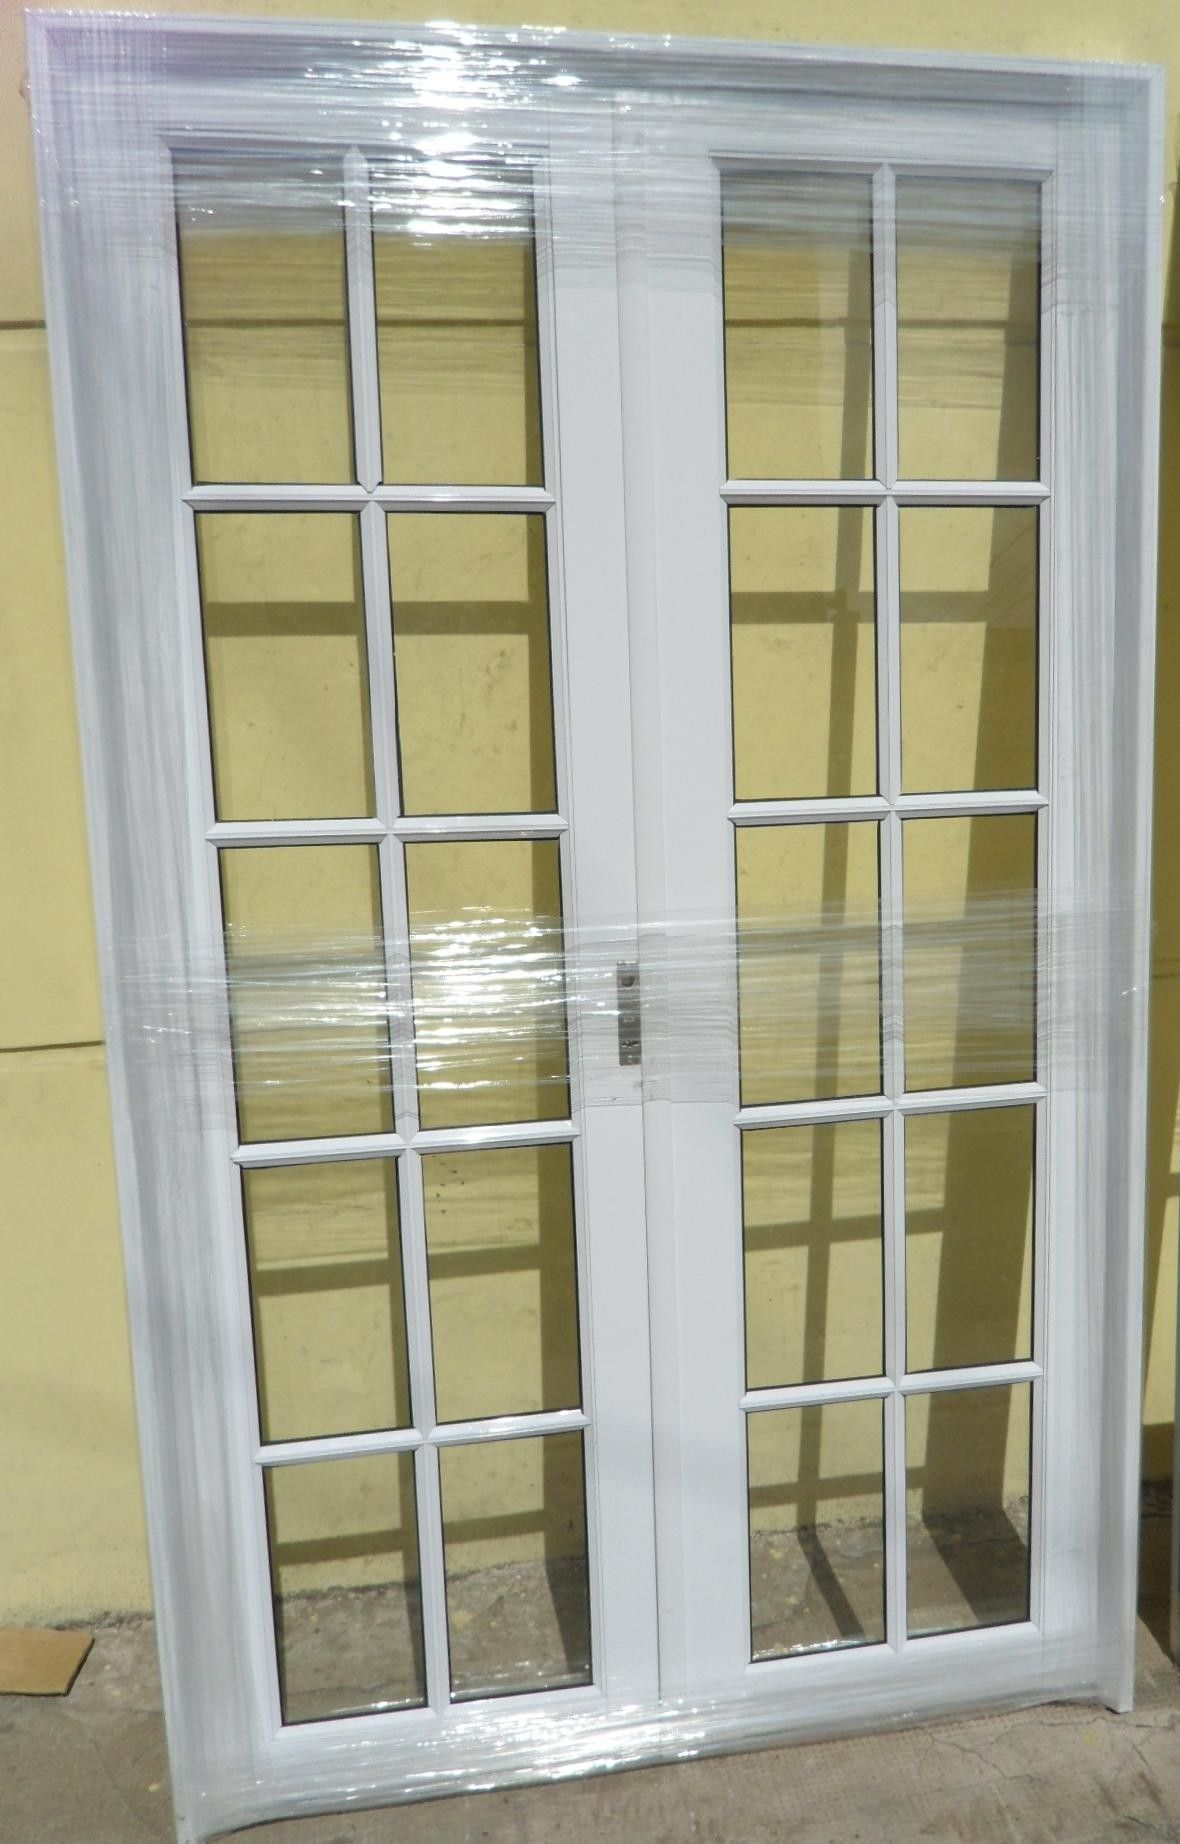 80 Alluring Front Door Designs To Refine Your Home: Puerta-aluminio-blanco-reforzada.jpg (1180×1844)